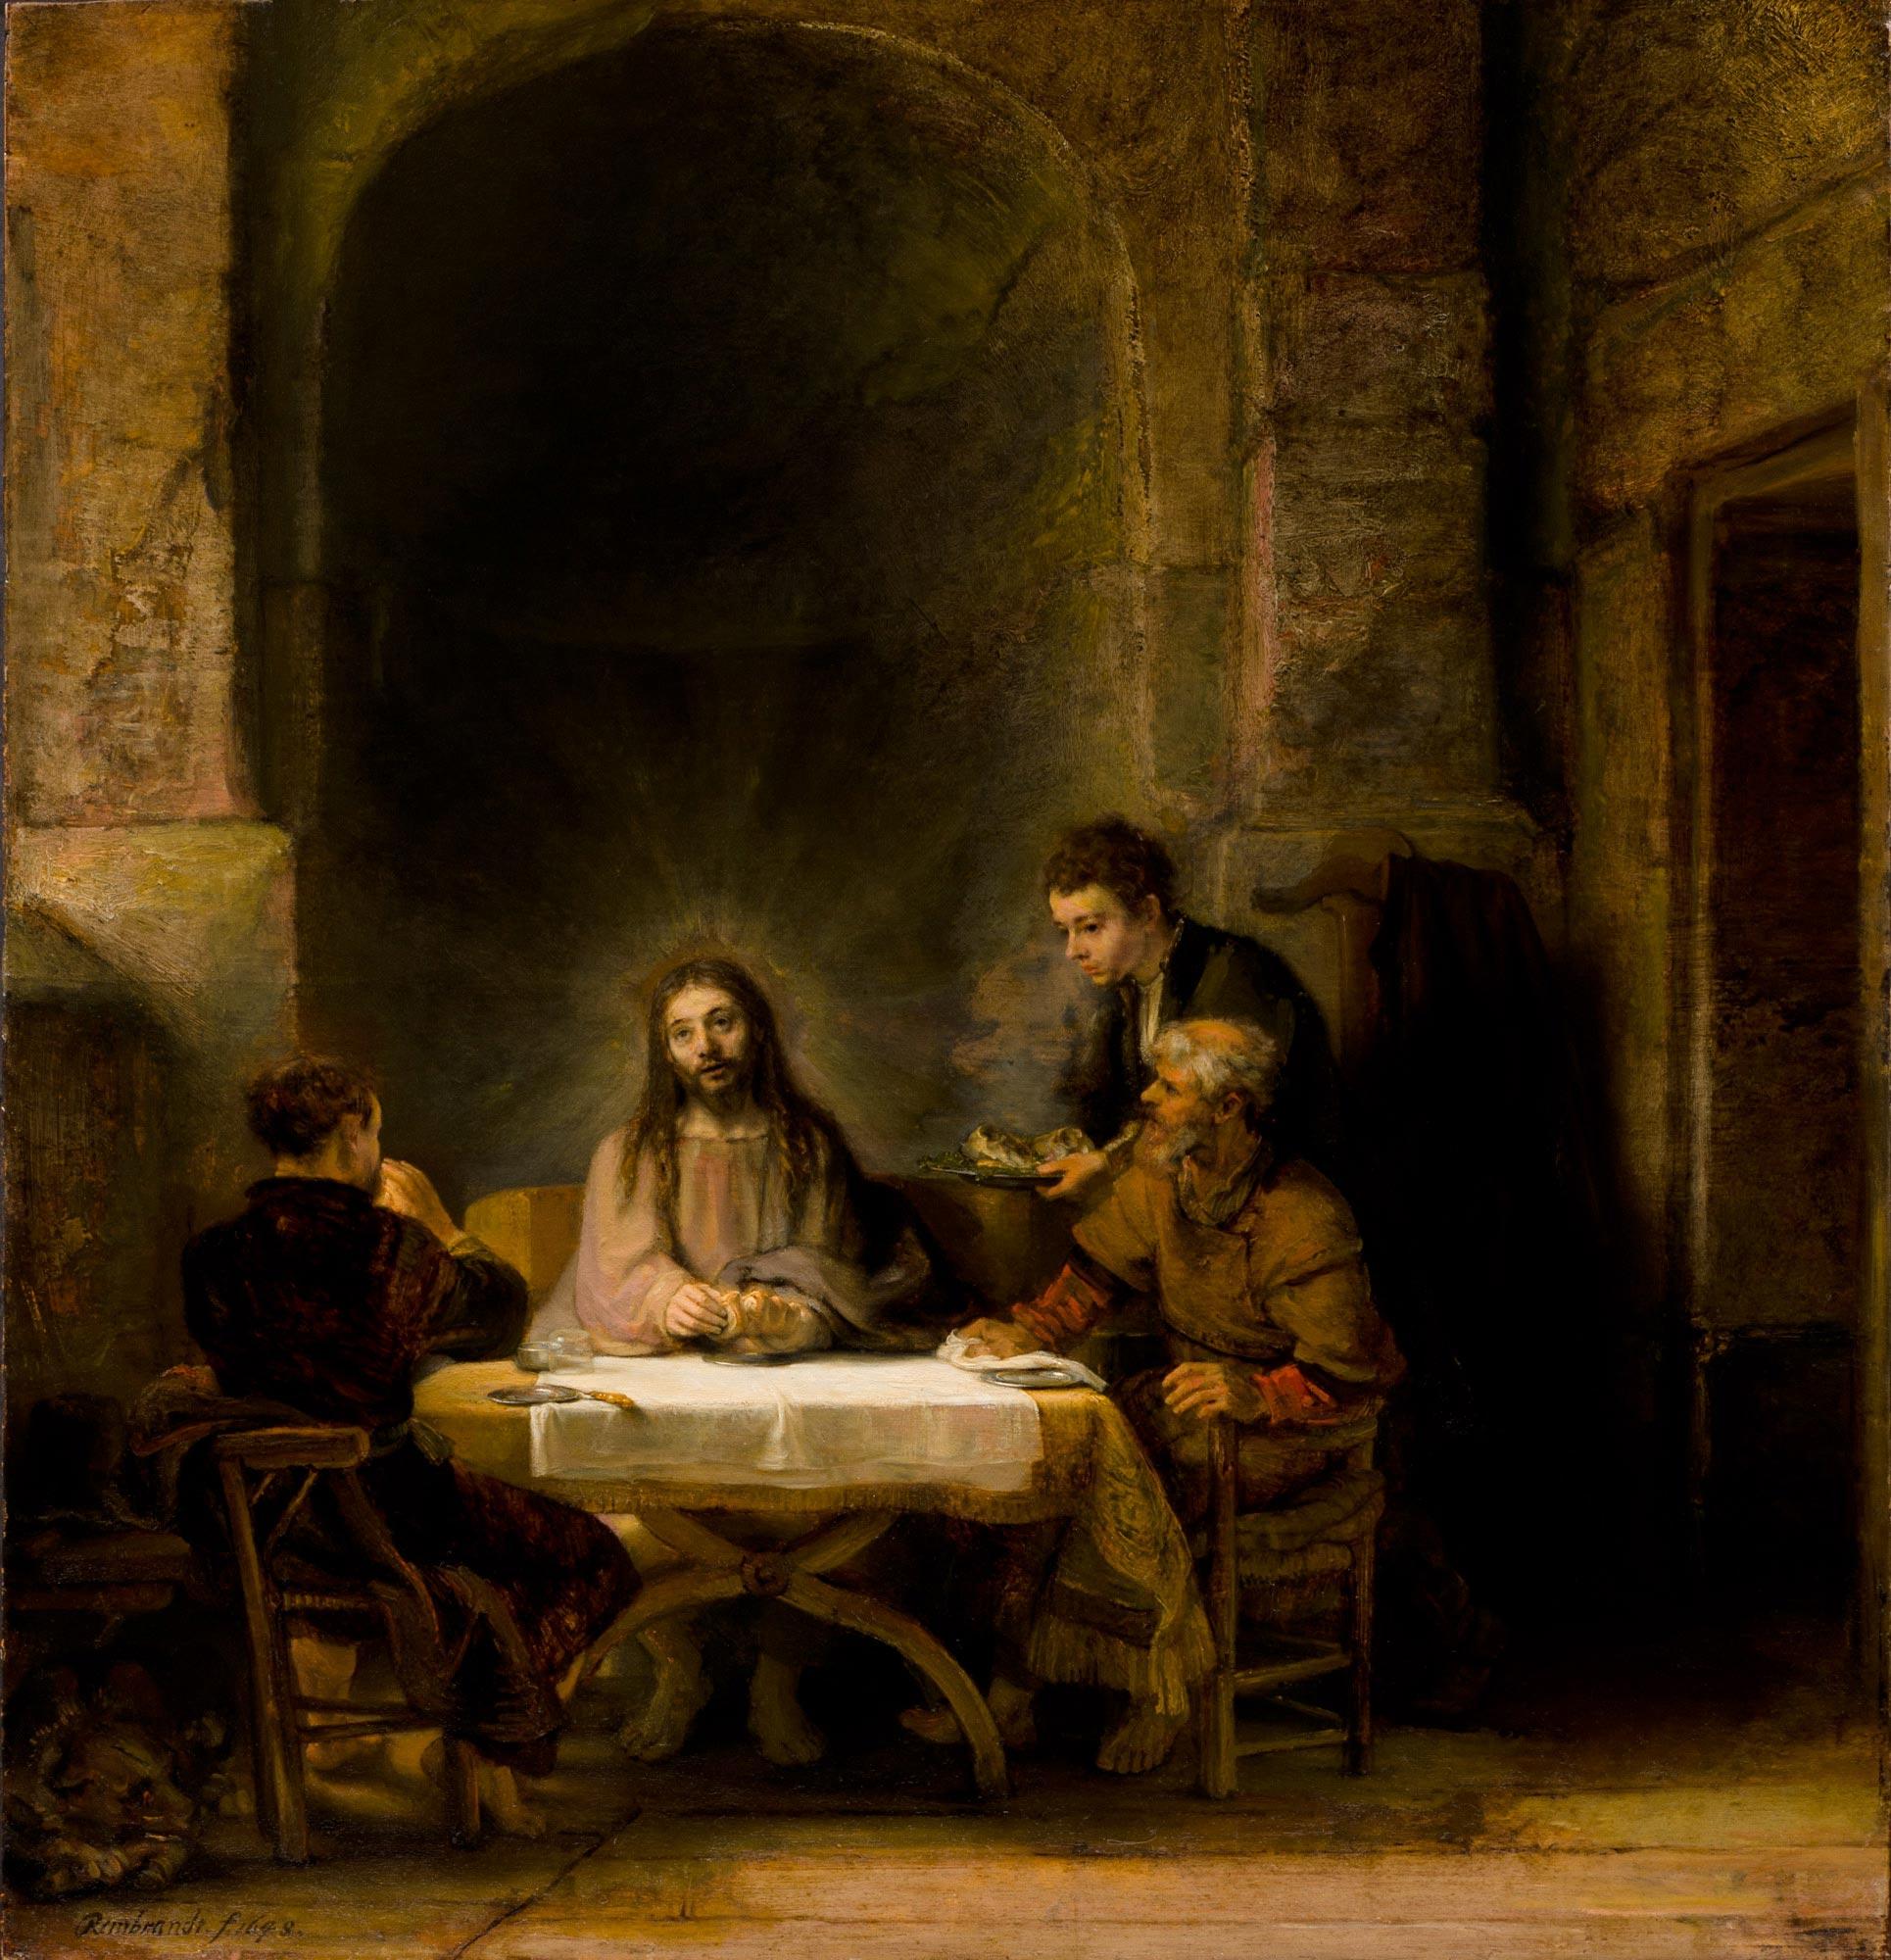 Rembrandt, Supper at Emmaus